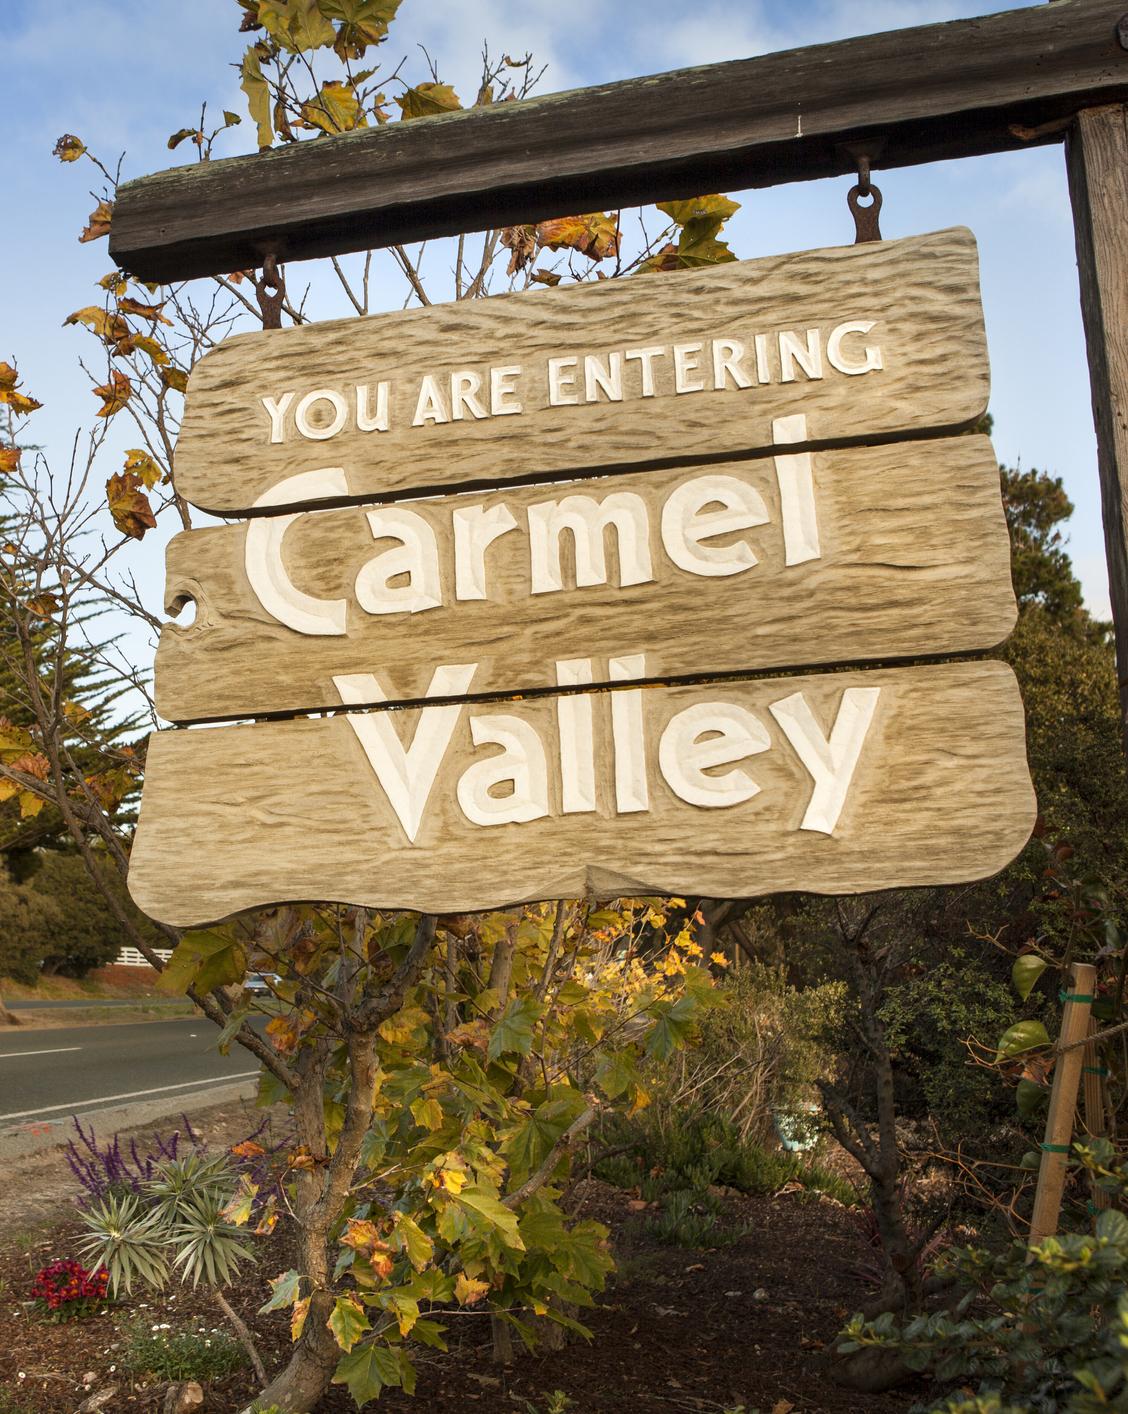 CarmelValley-1 san diego restaurant week